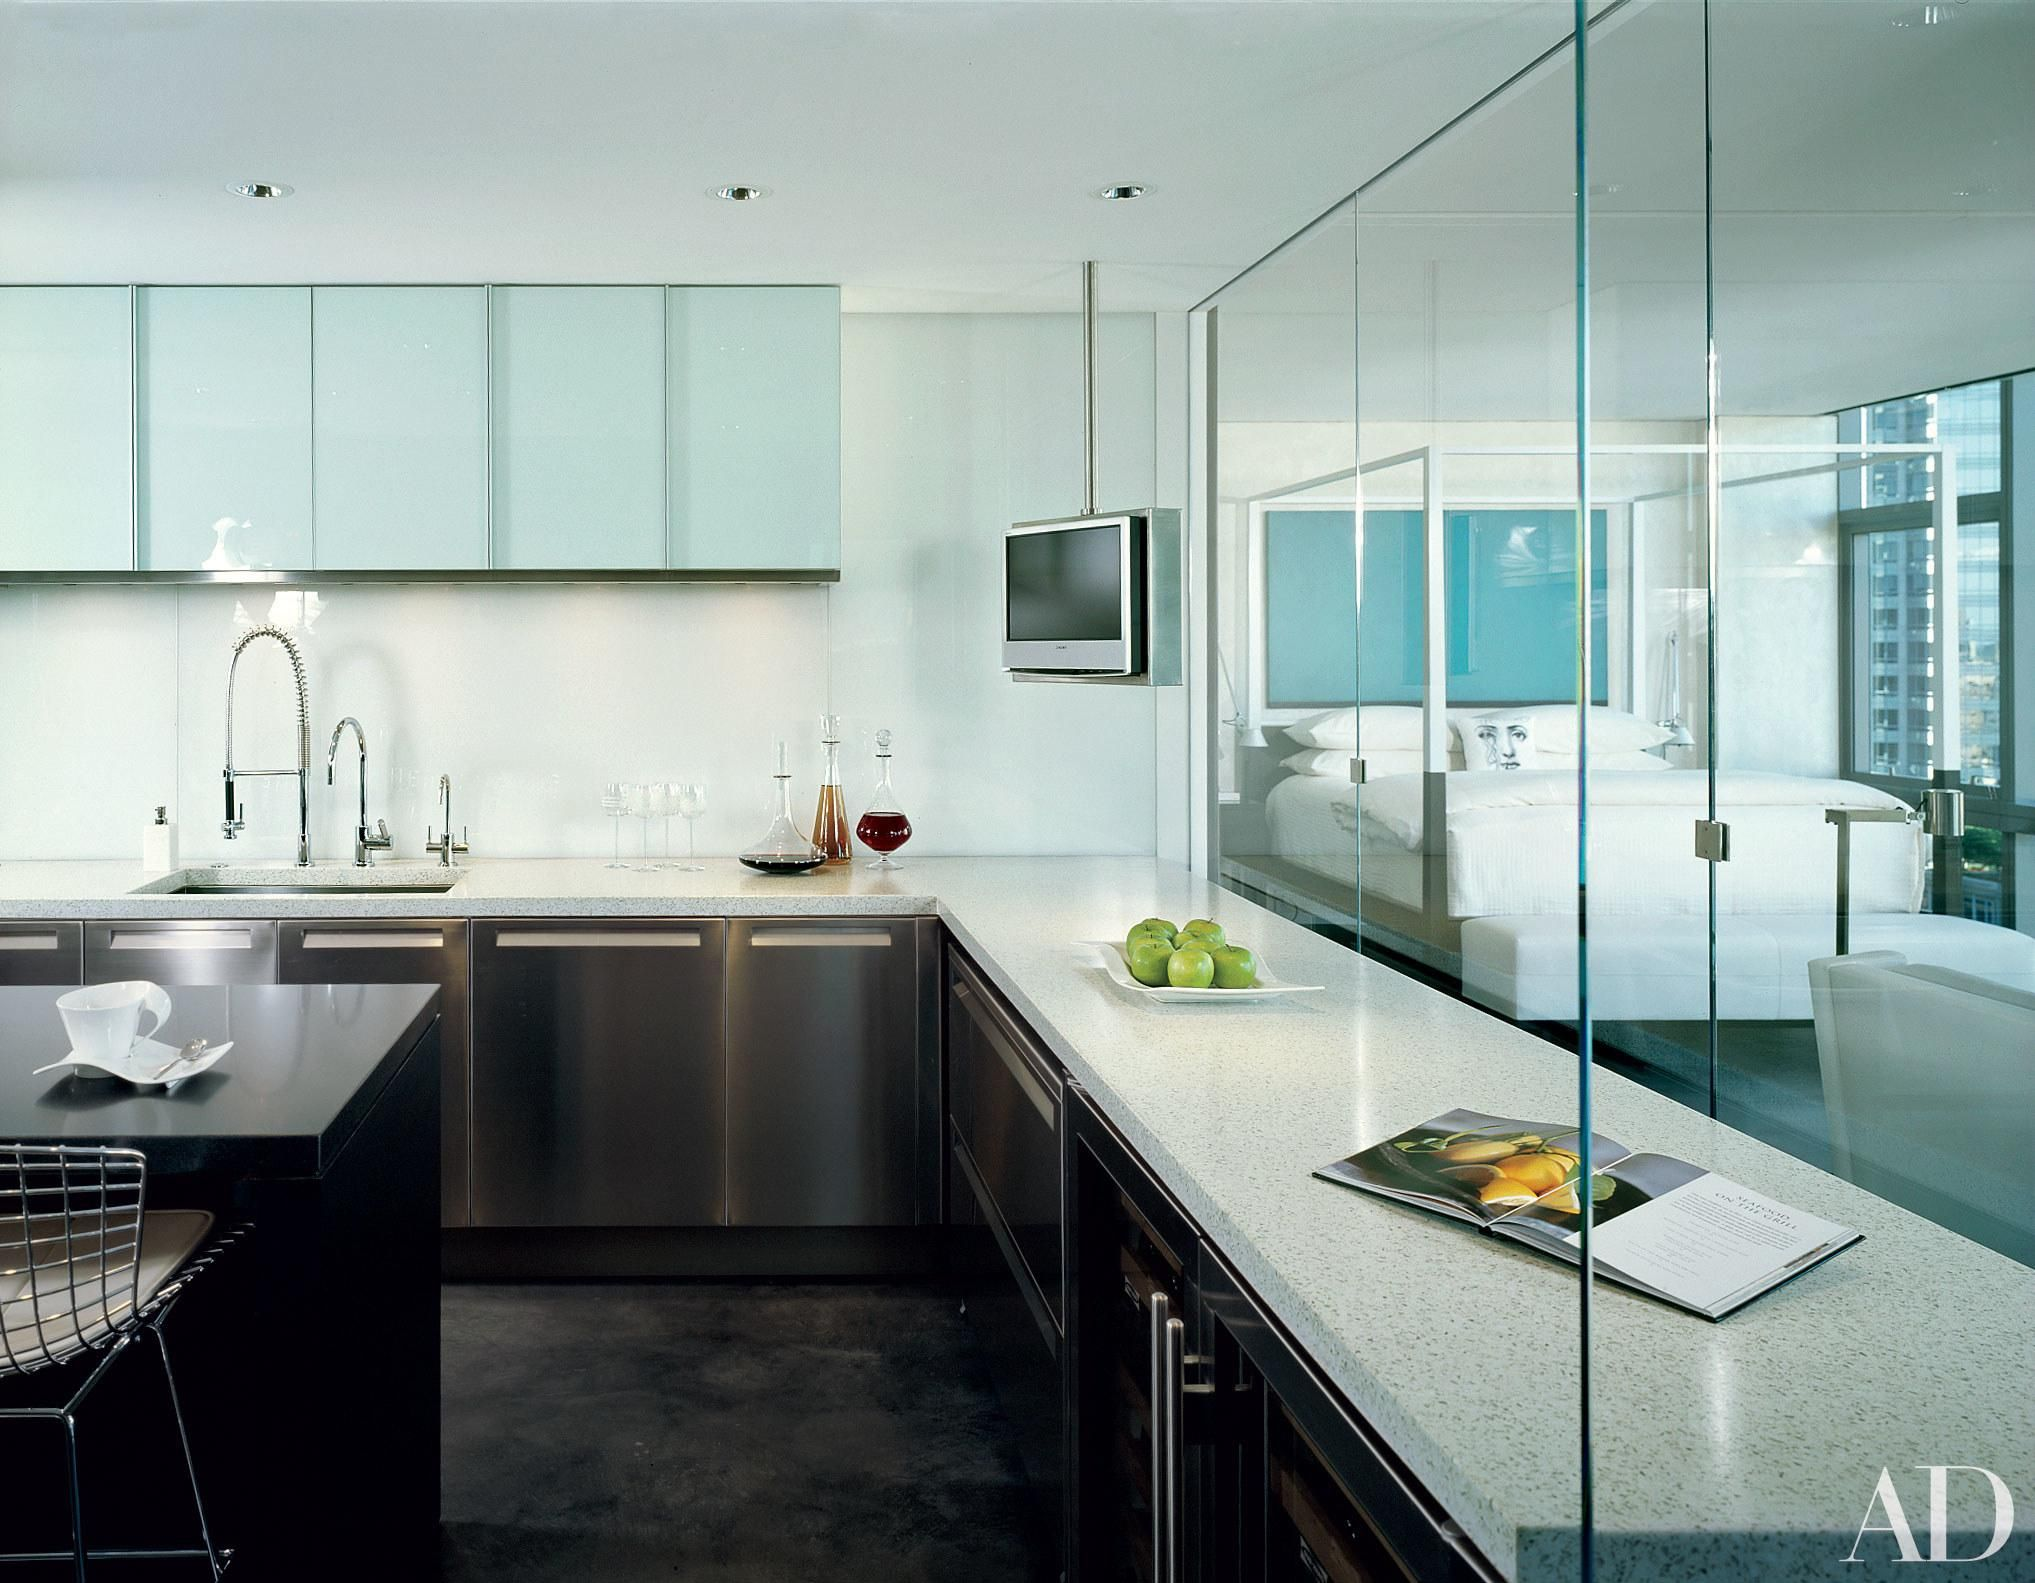 11 Stunning Minimalist Kitchens From The AD Archives   Minimalist ...